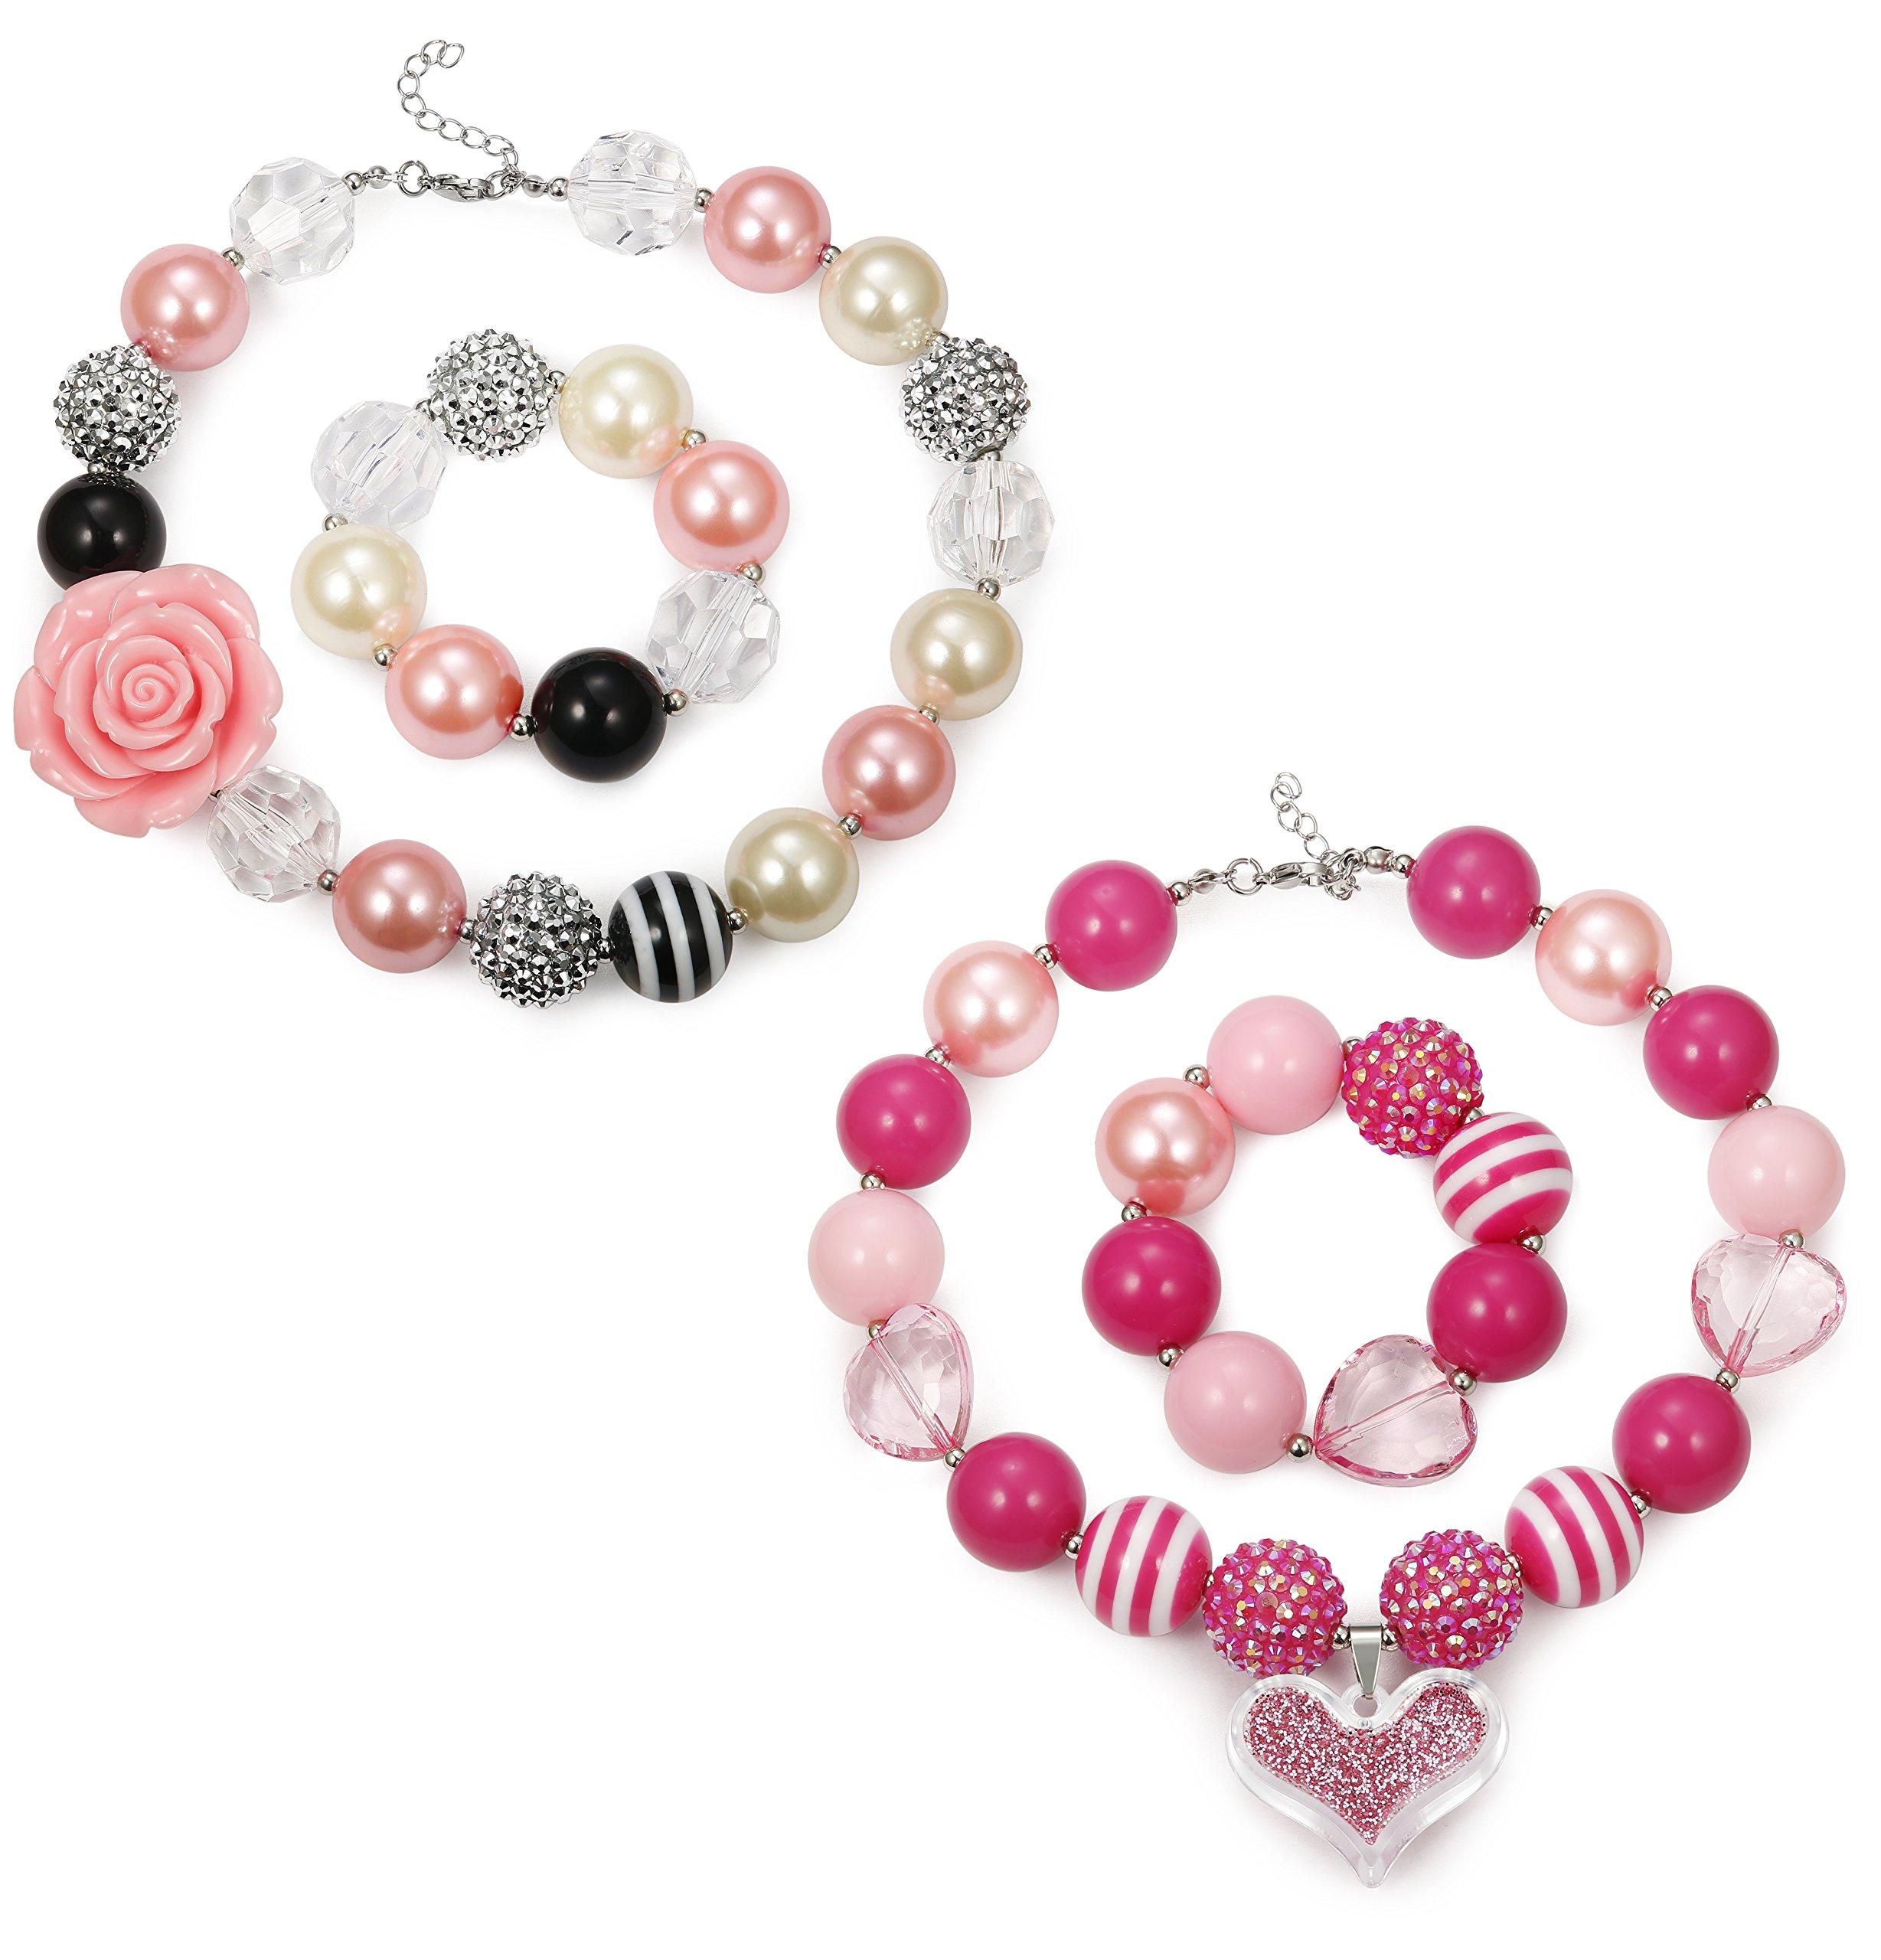 FINREZIO Bubblegum Necklace Chunky Bead Bracelet for Kids Girls